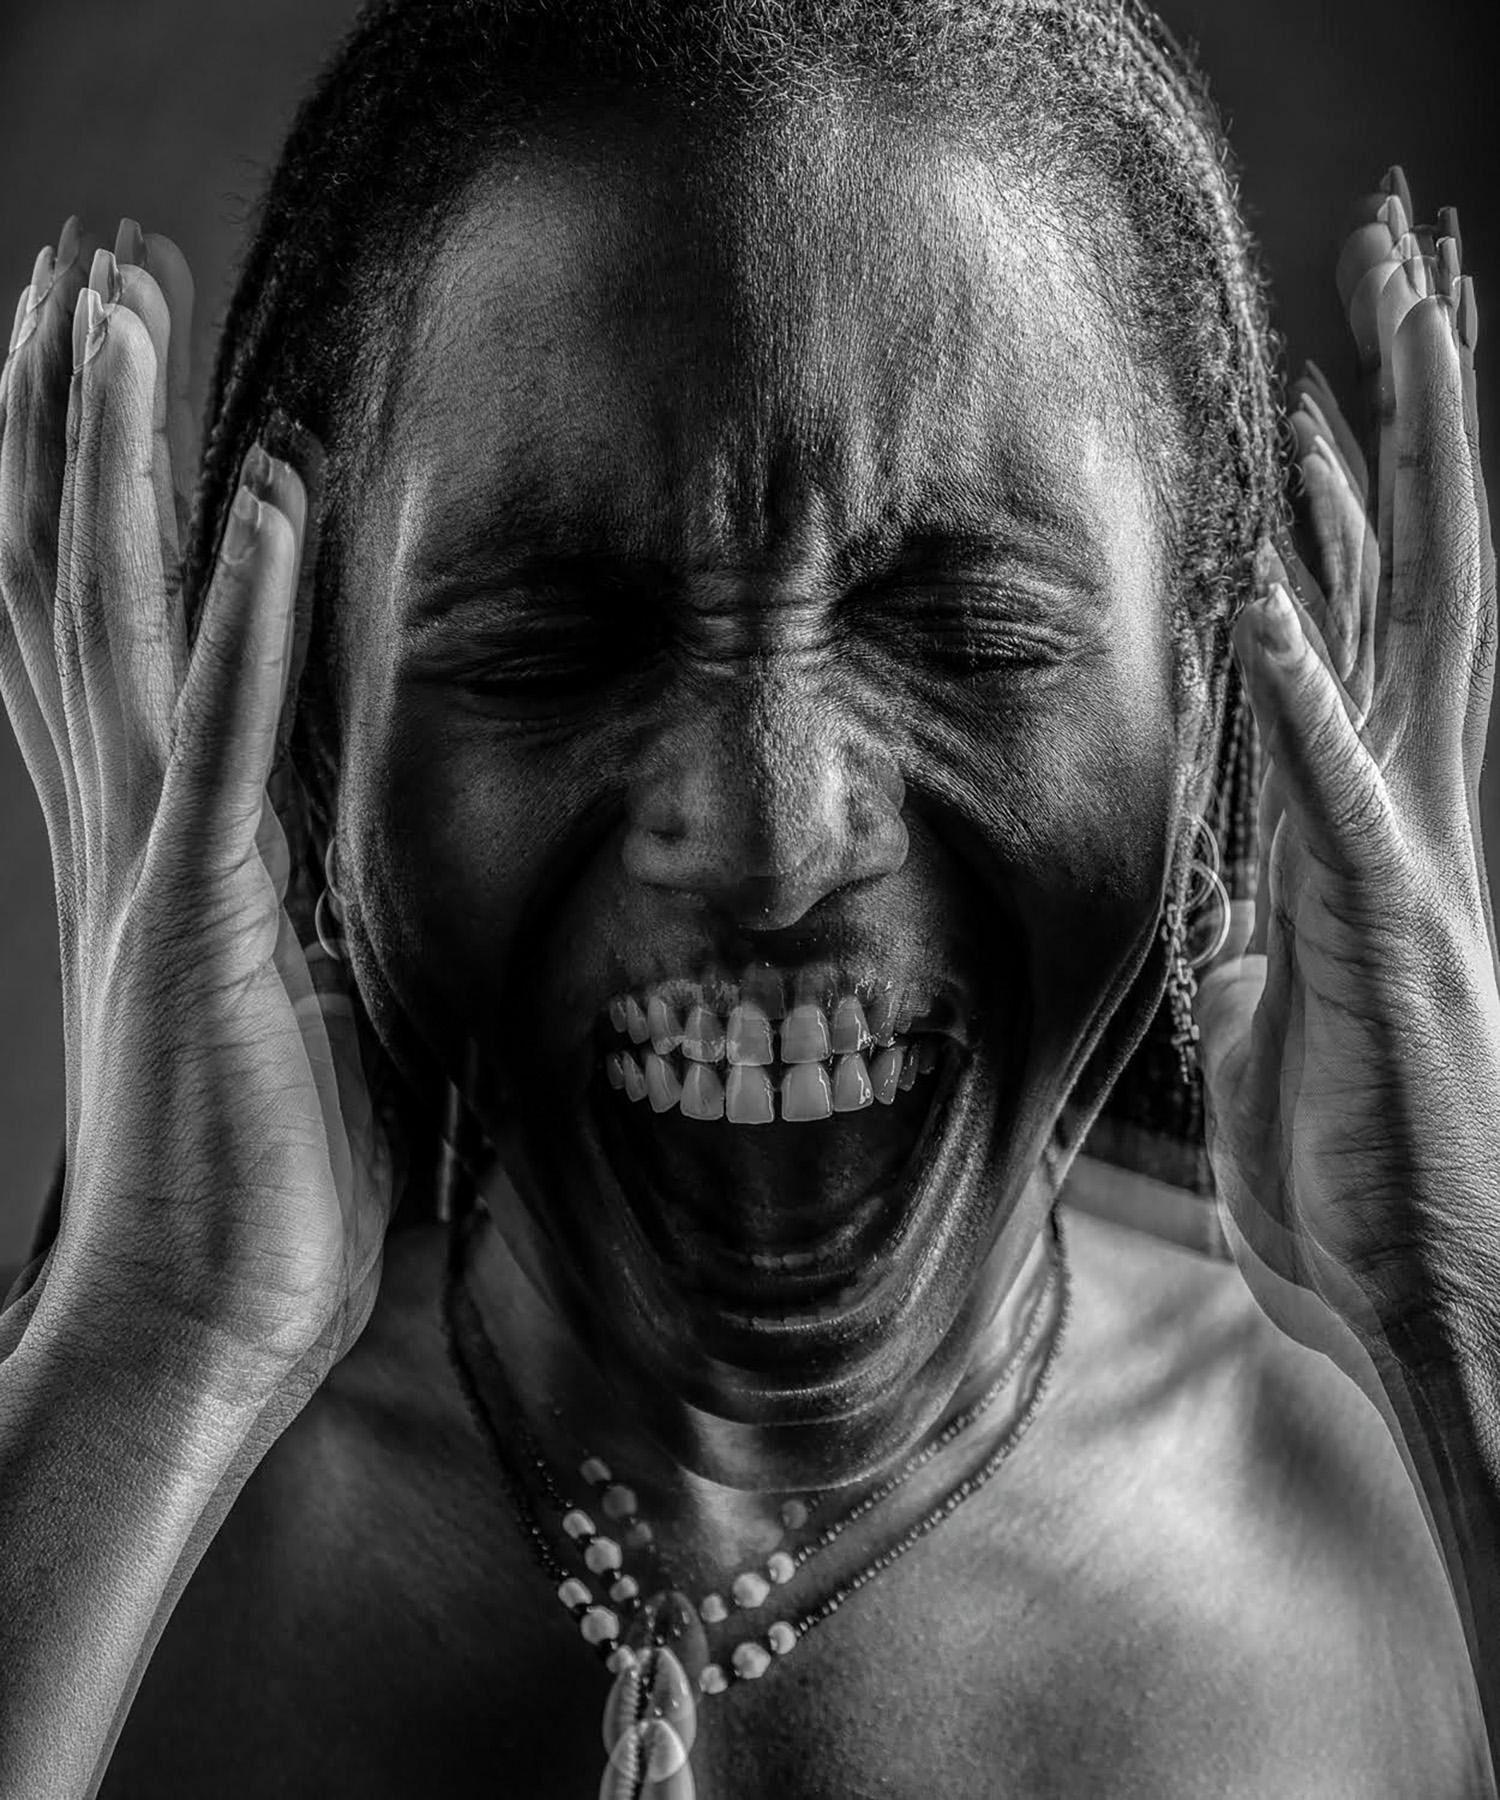 """Scream,"" inkjet prints on pictorico film, by Sarah Townsend '20"